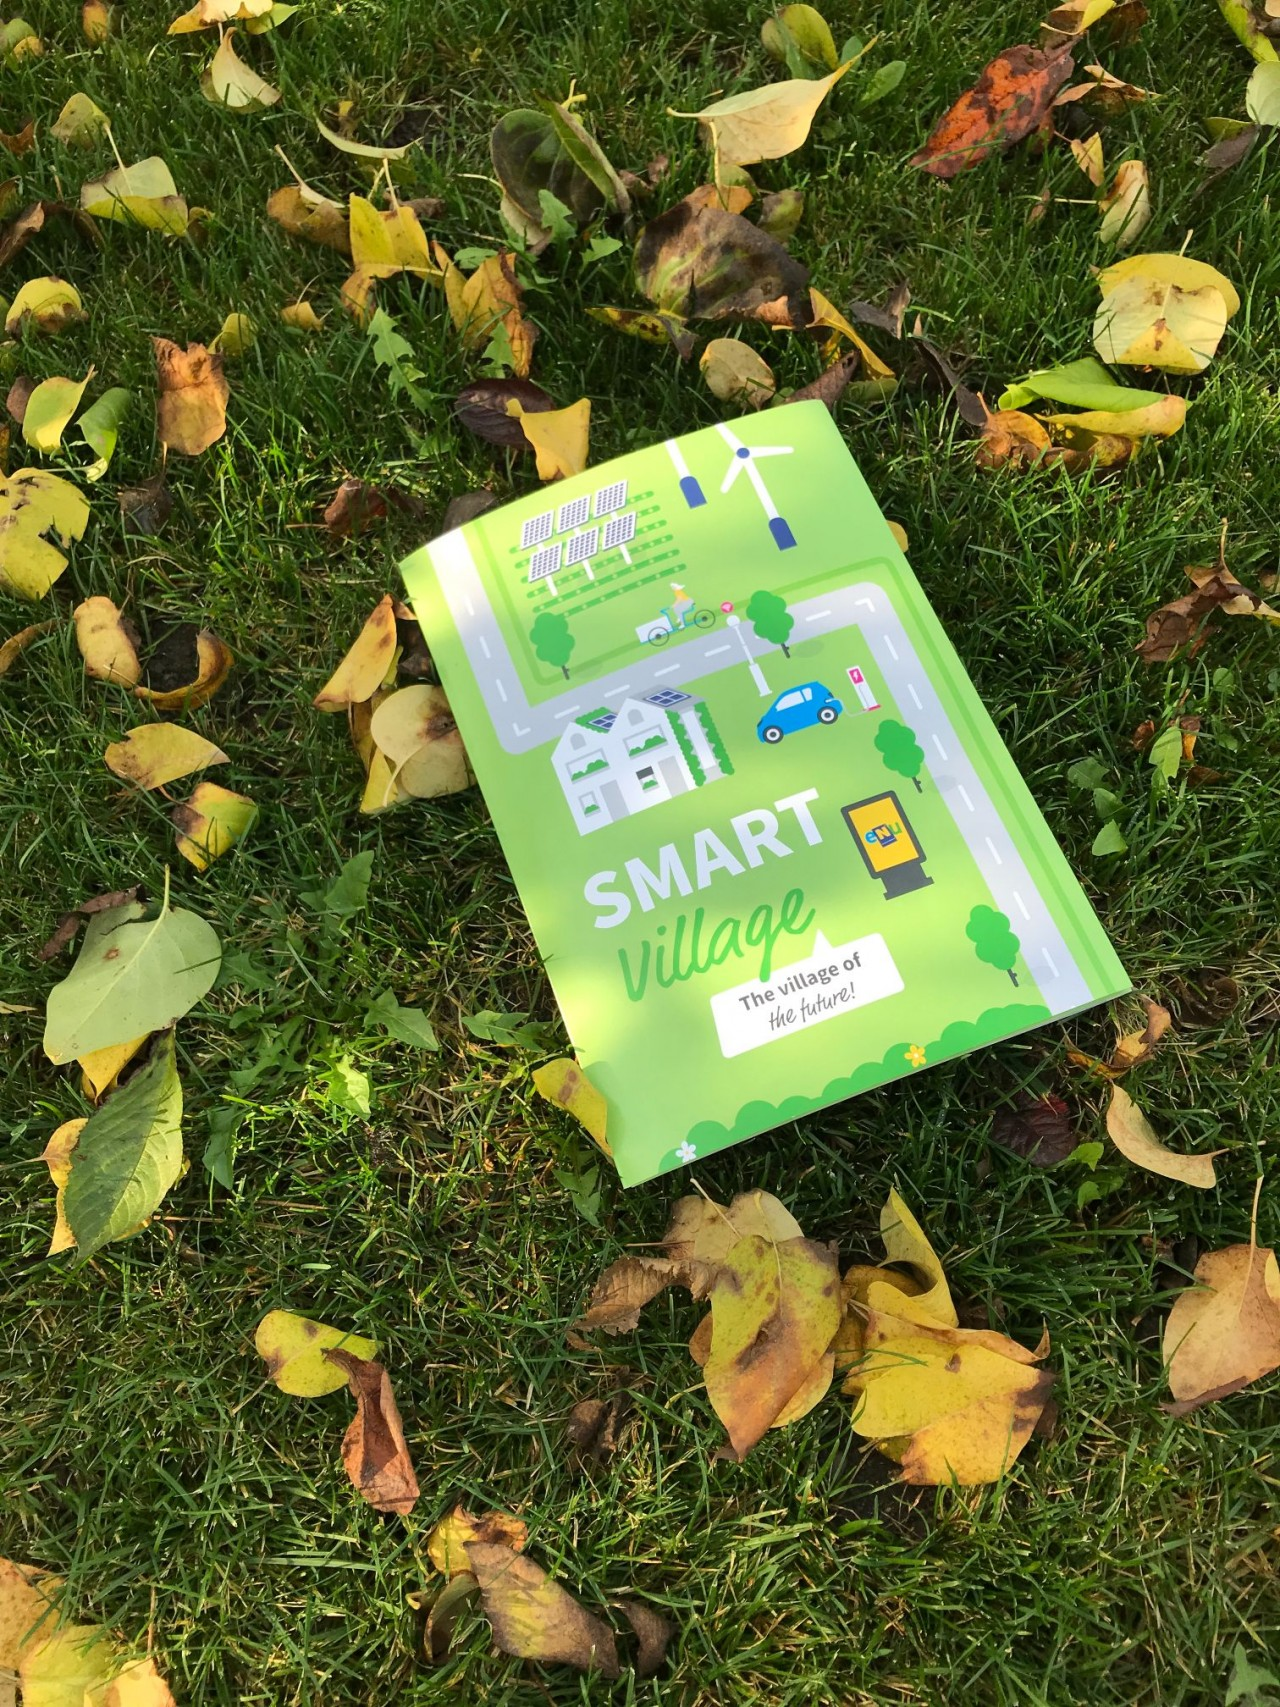 enu-smart-village-broschuere-folder-03.jpg